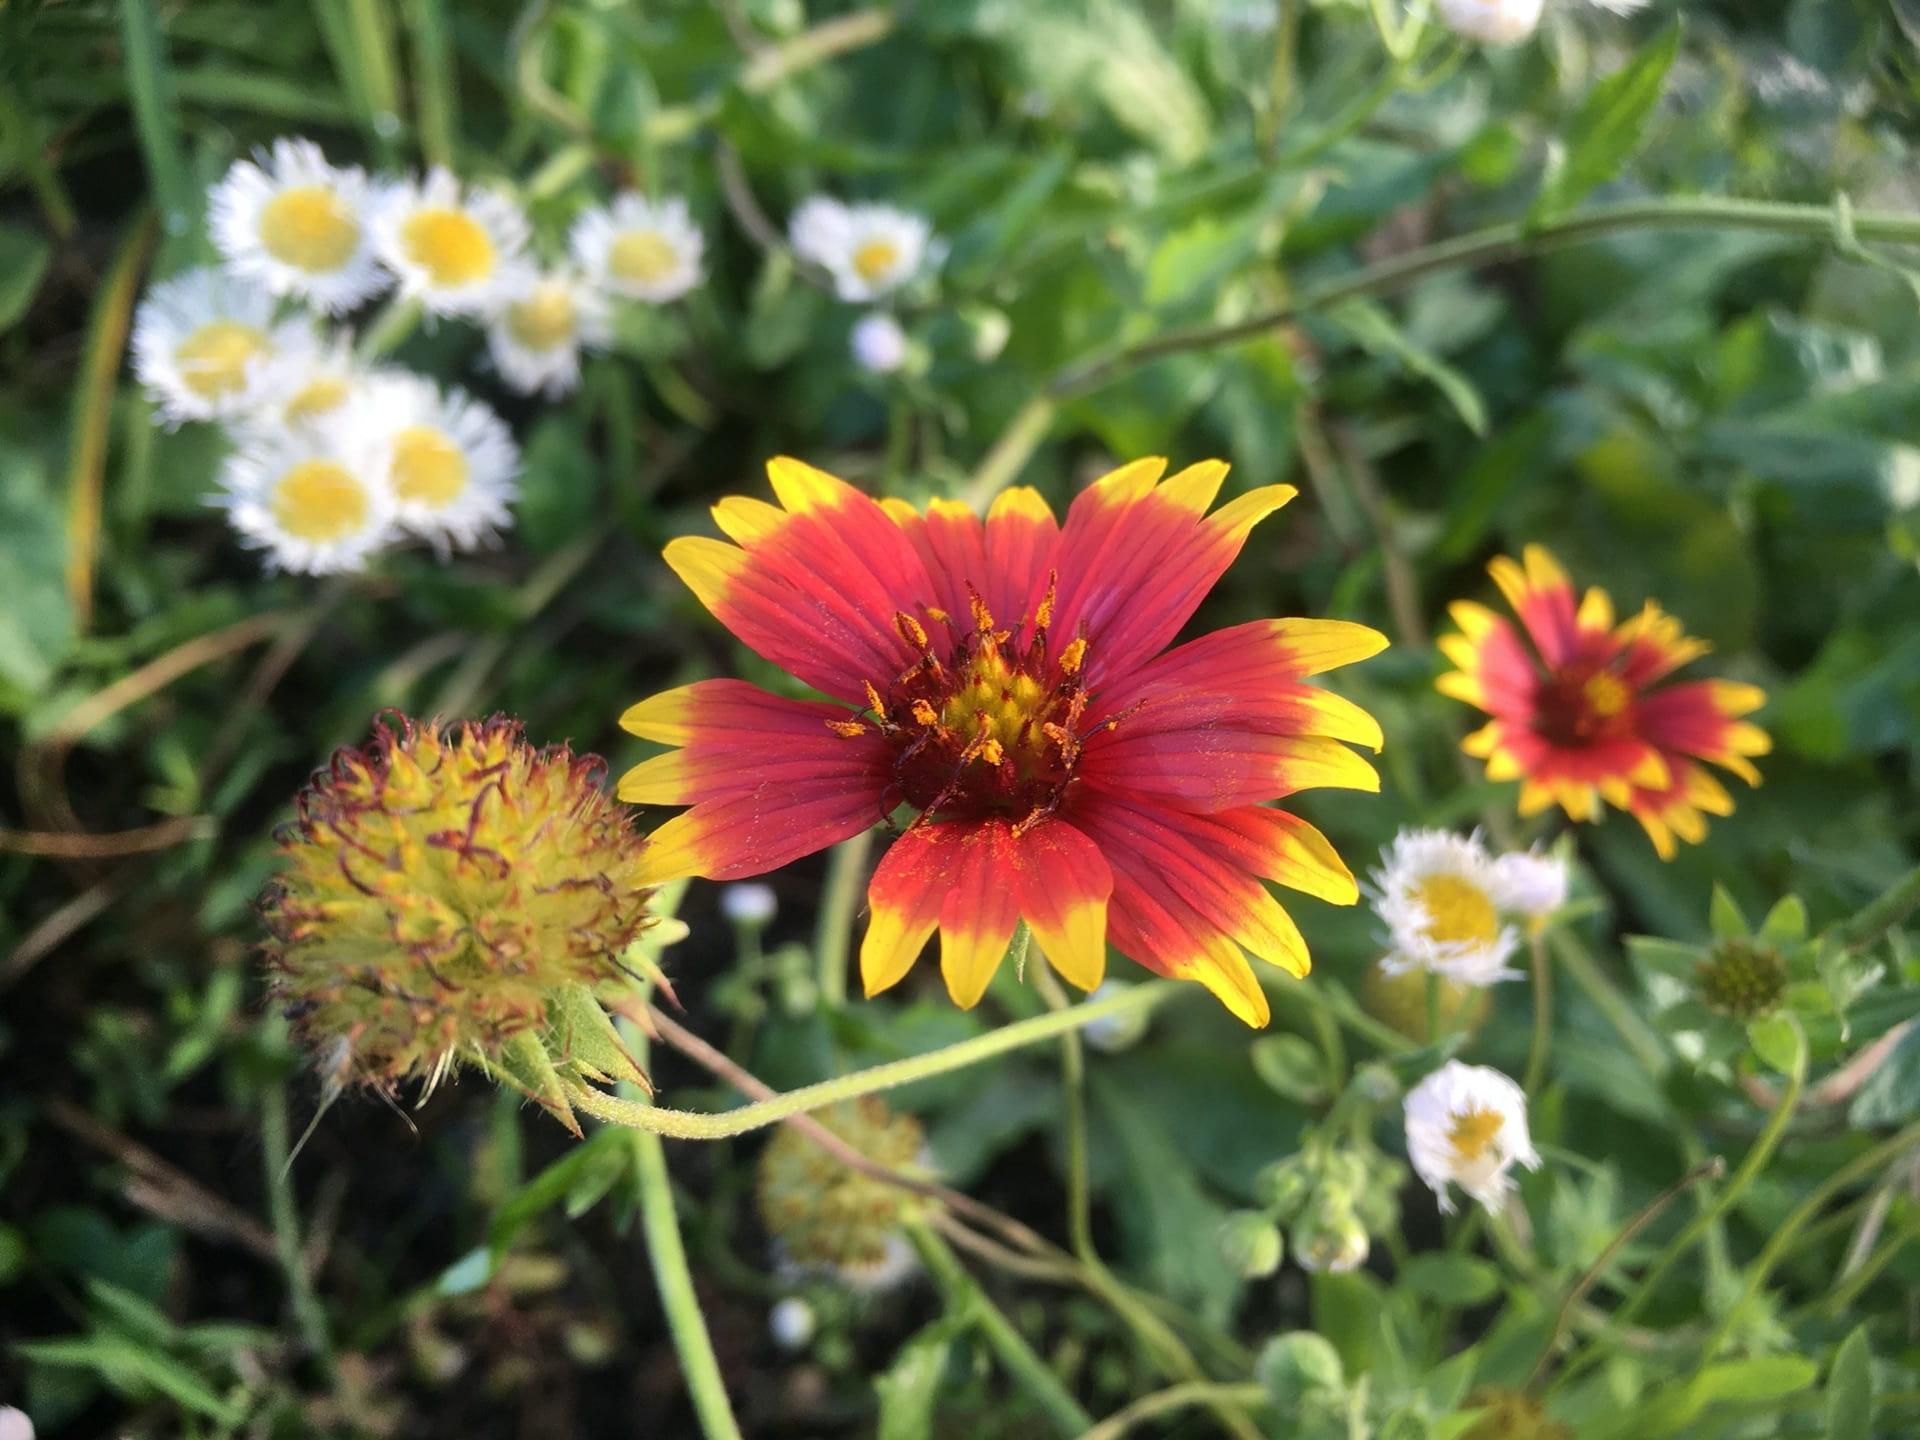 Gaillardia pulchella blooms scramble through Erigeron Philadelphicus.